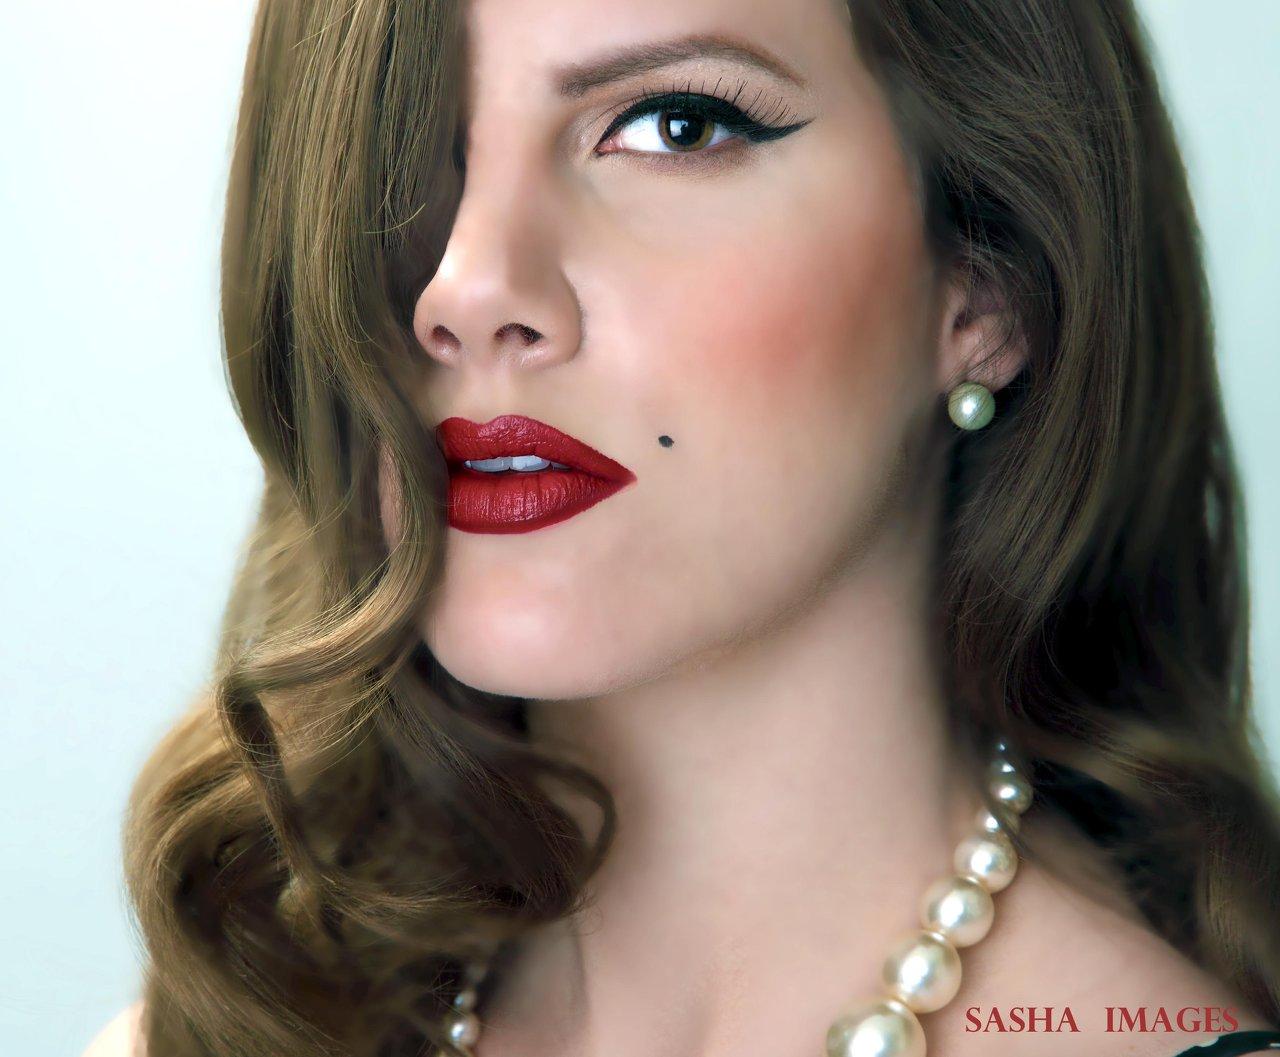 vintage hair and makeup artist